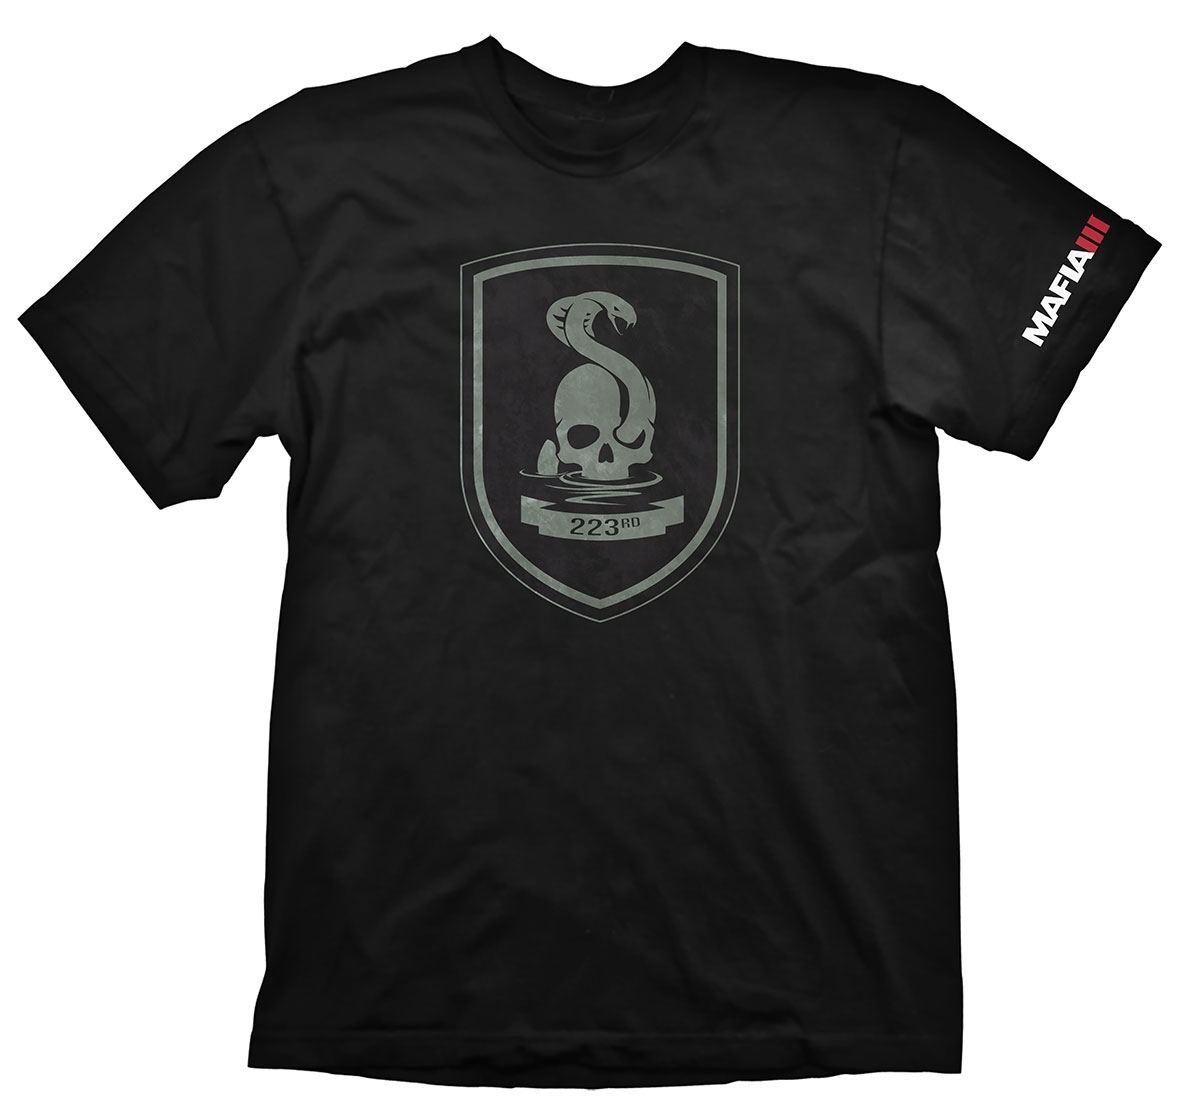 Mafia III T-Shirt 223rd Size M